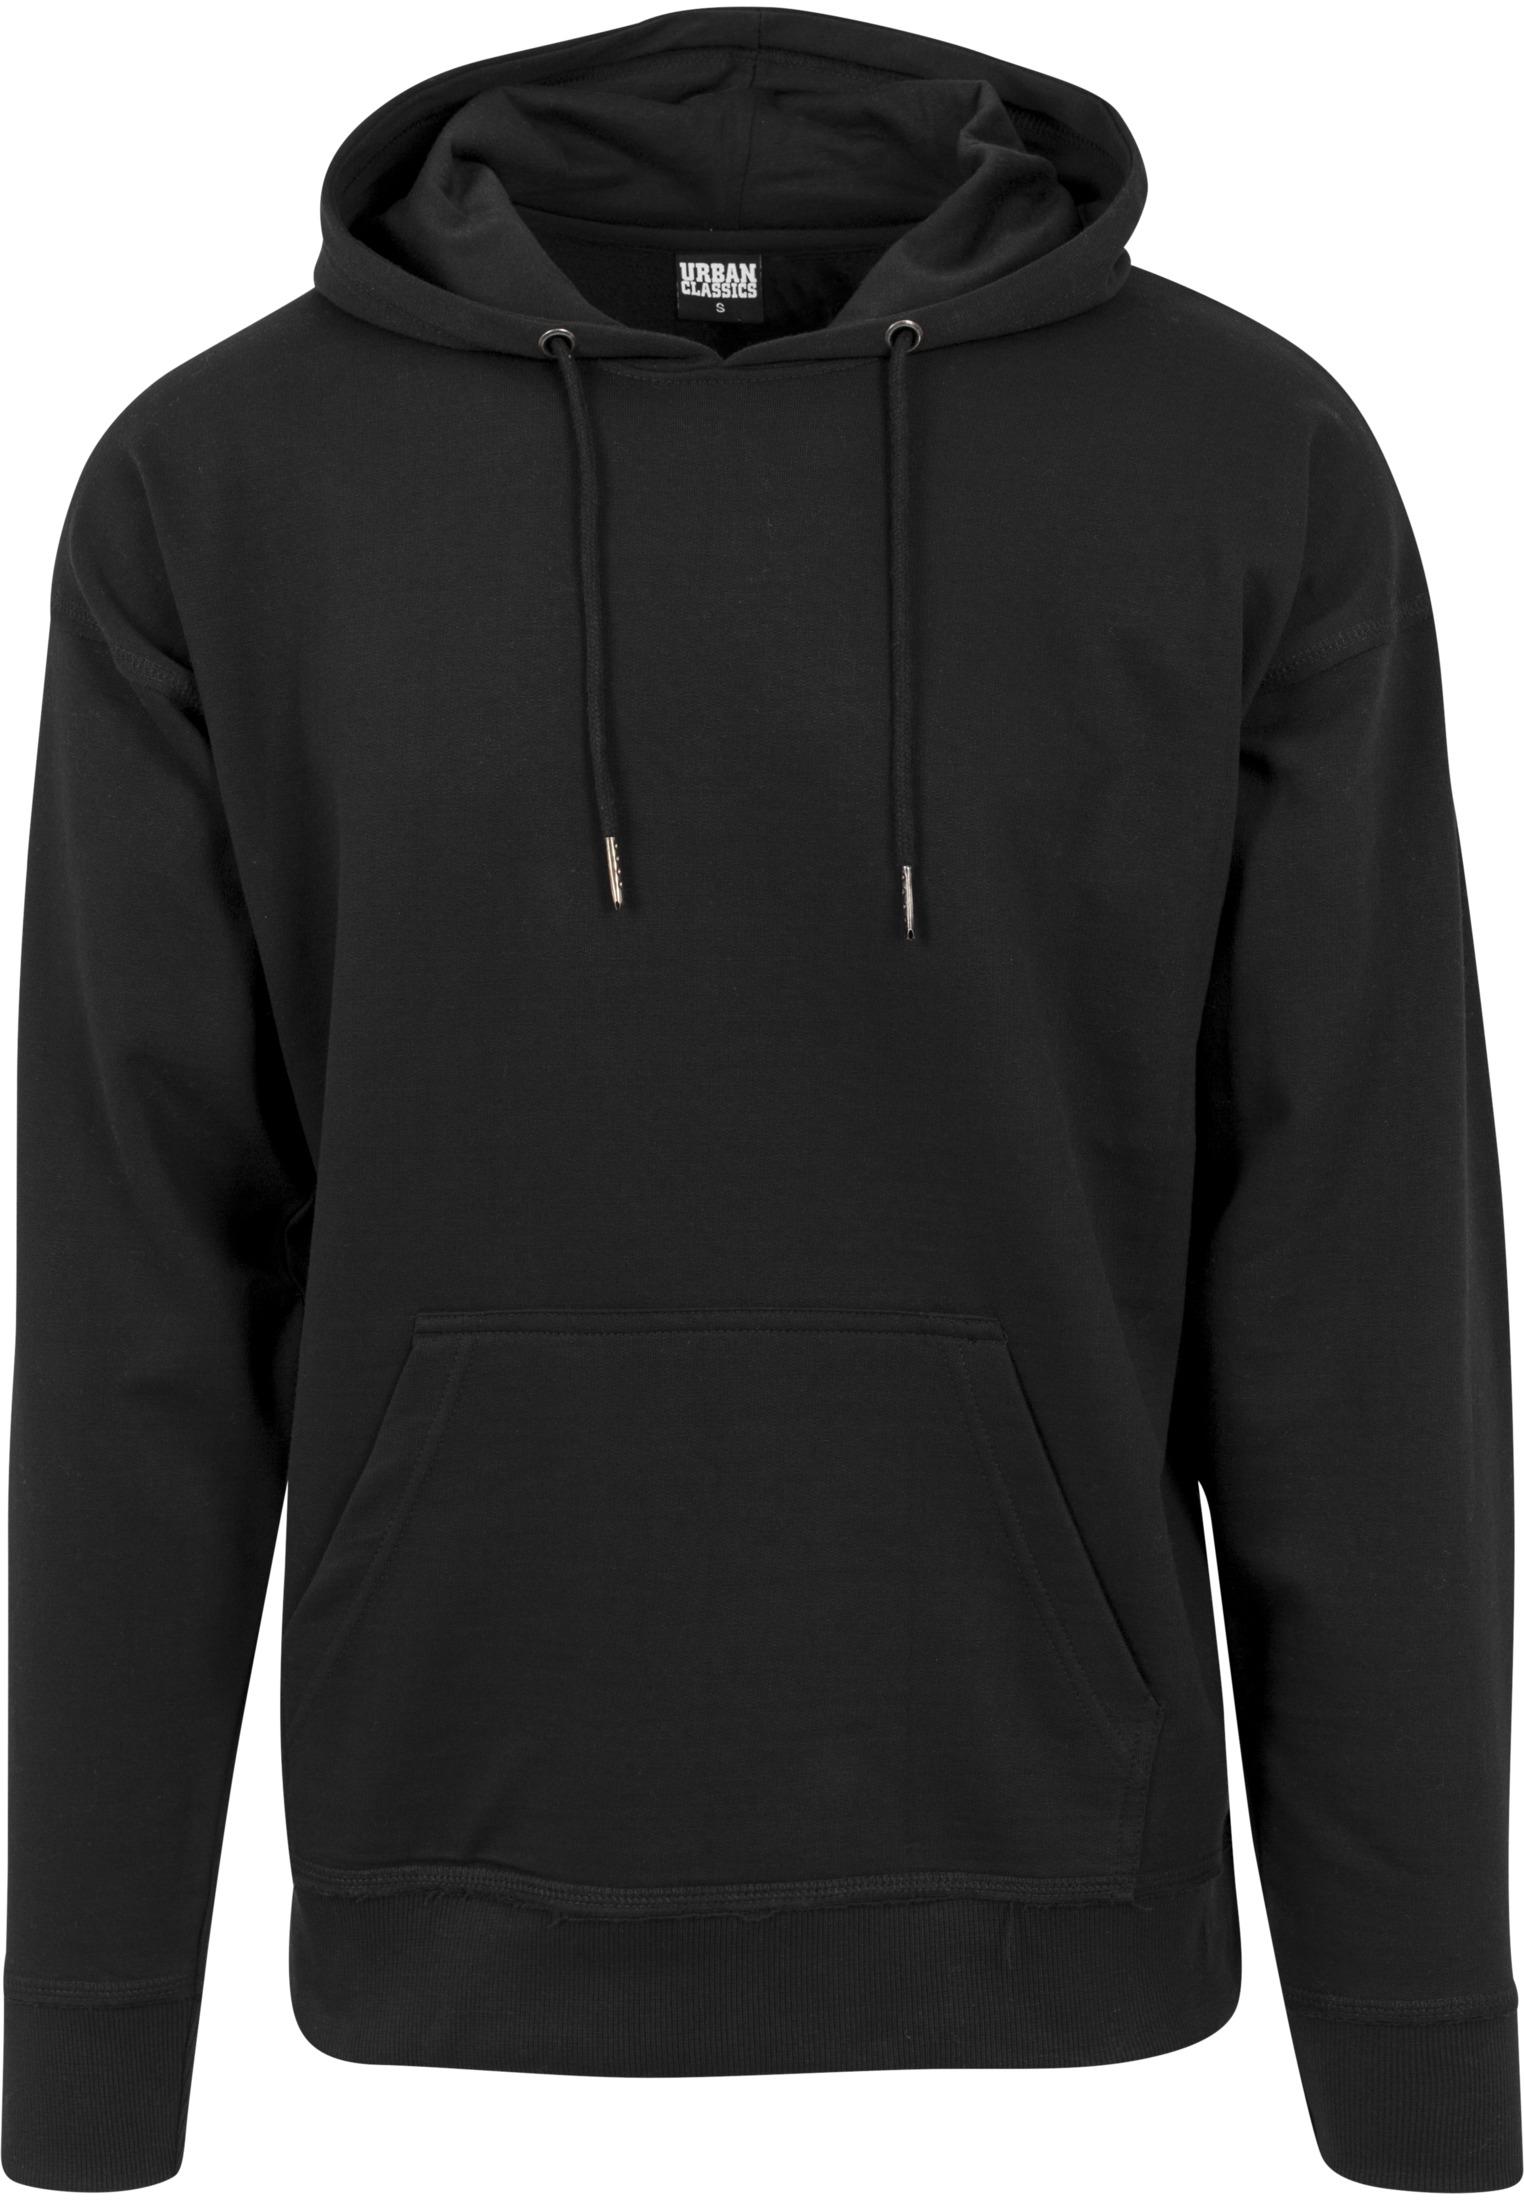 oversized sweat hoody sweatshirt kapuze kapuzensweatshirt. Black Bedroom Furniture Sets. Home Design Ideas